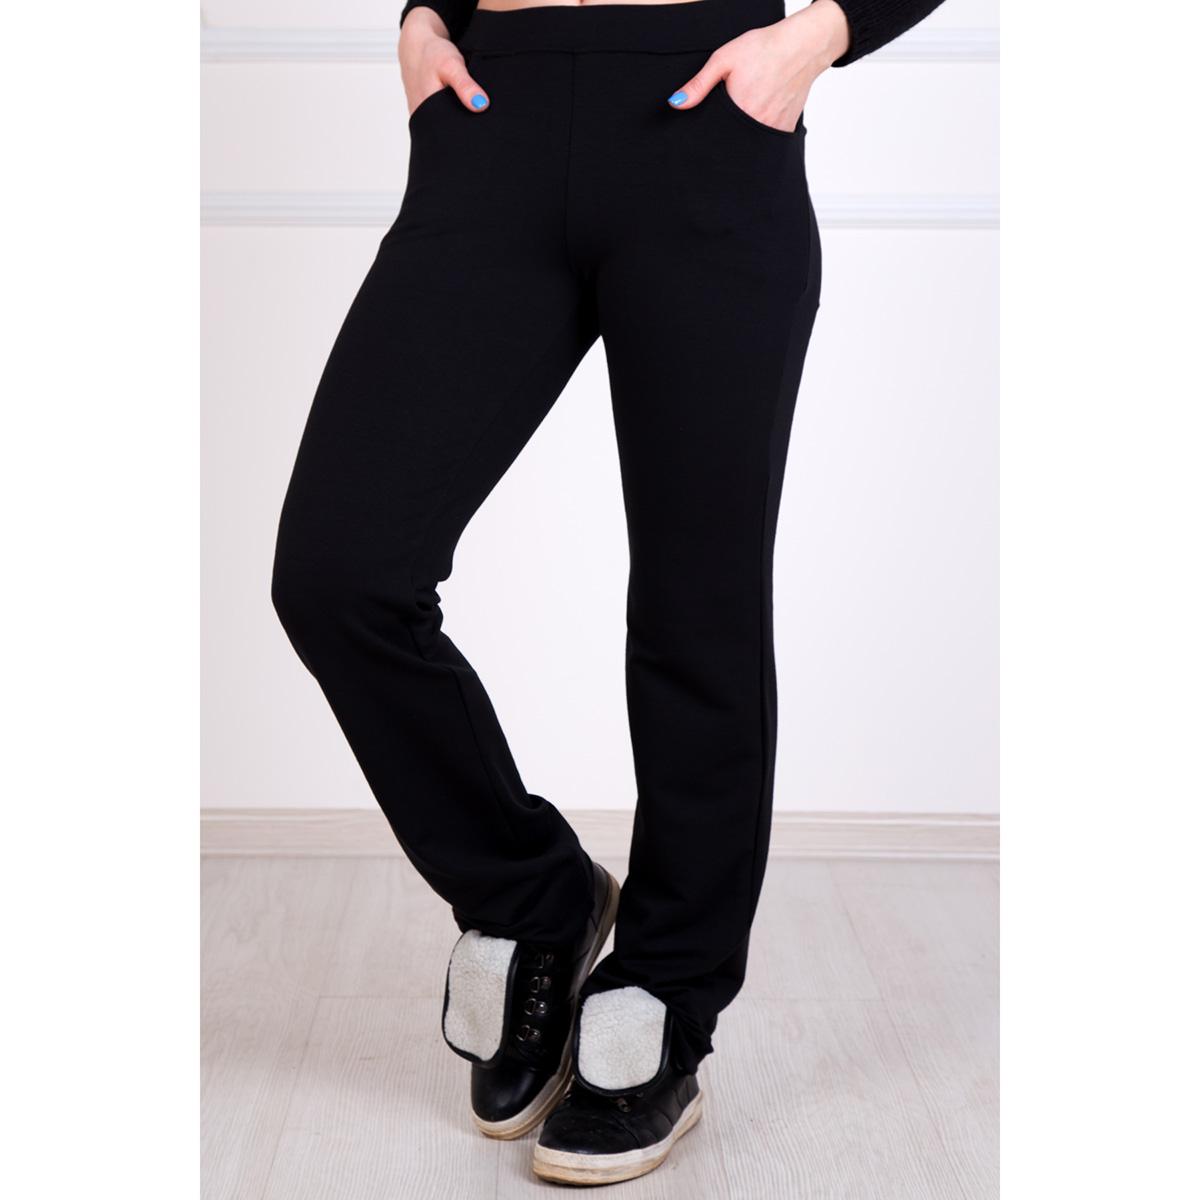 Женские брюки Симона Черный, размер 56Брюки<br>Обхват талии:92 см<br>Обхват бедер:120 см<br>Рост:167 см<br><br>Тип: Жен. брюки<br>Размер: 56<br>Материал: Футер